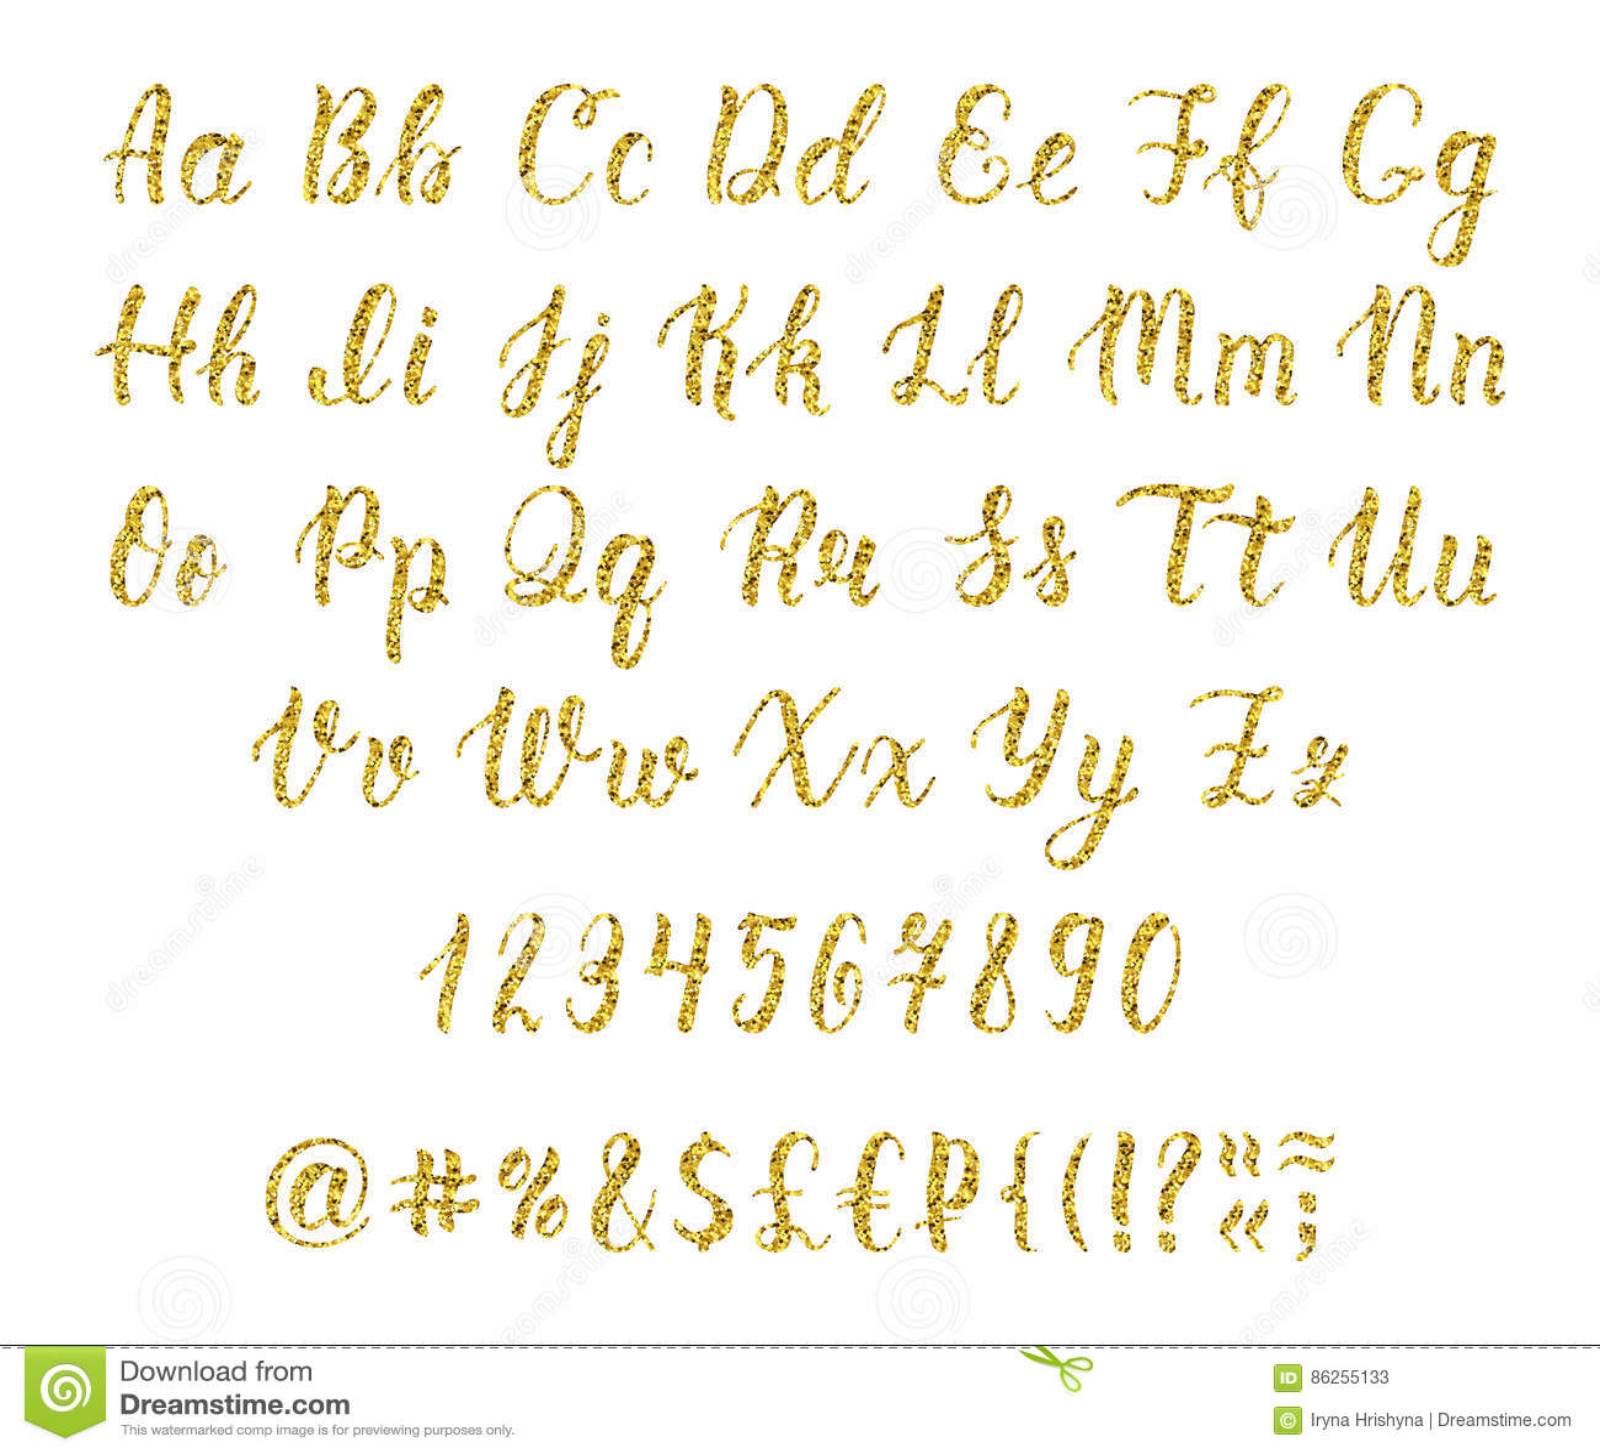 Handwritten latin calligraphy brush script with numbers and download handwritten latin calligraphy brush script with numbers and punctuation marks gold glitter alphabet altavistaventures Image collections